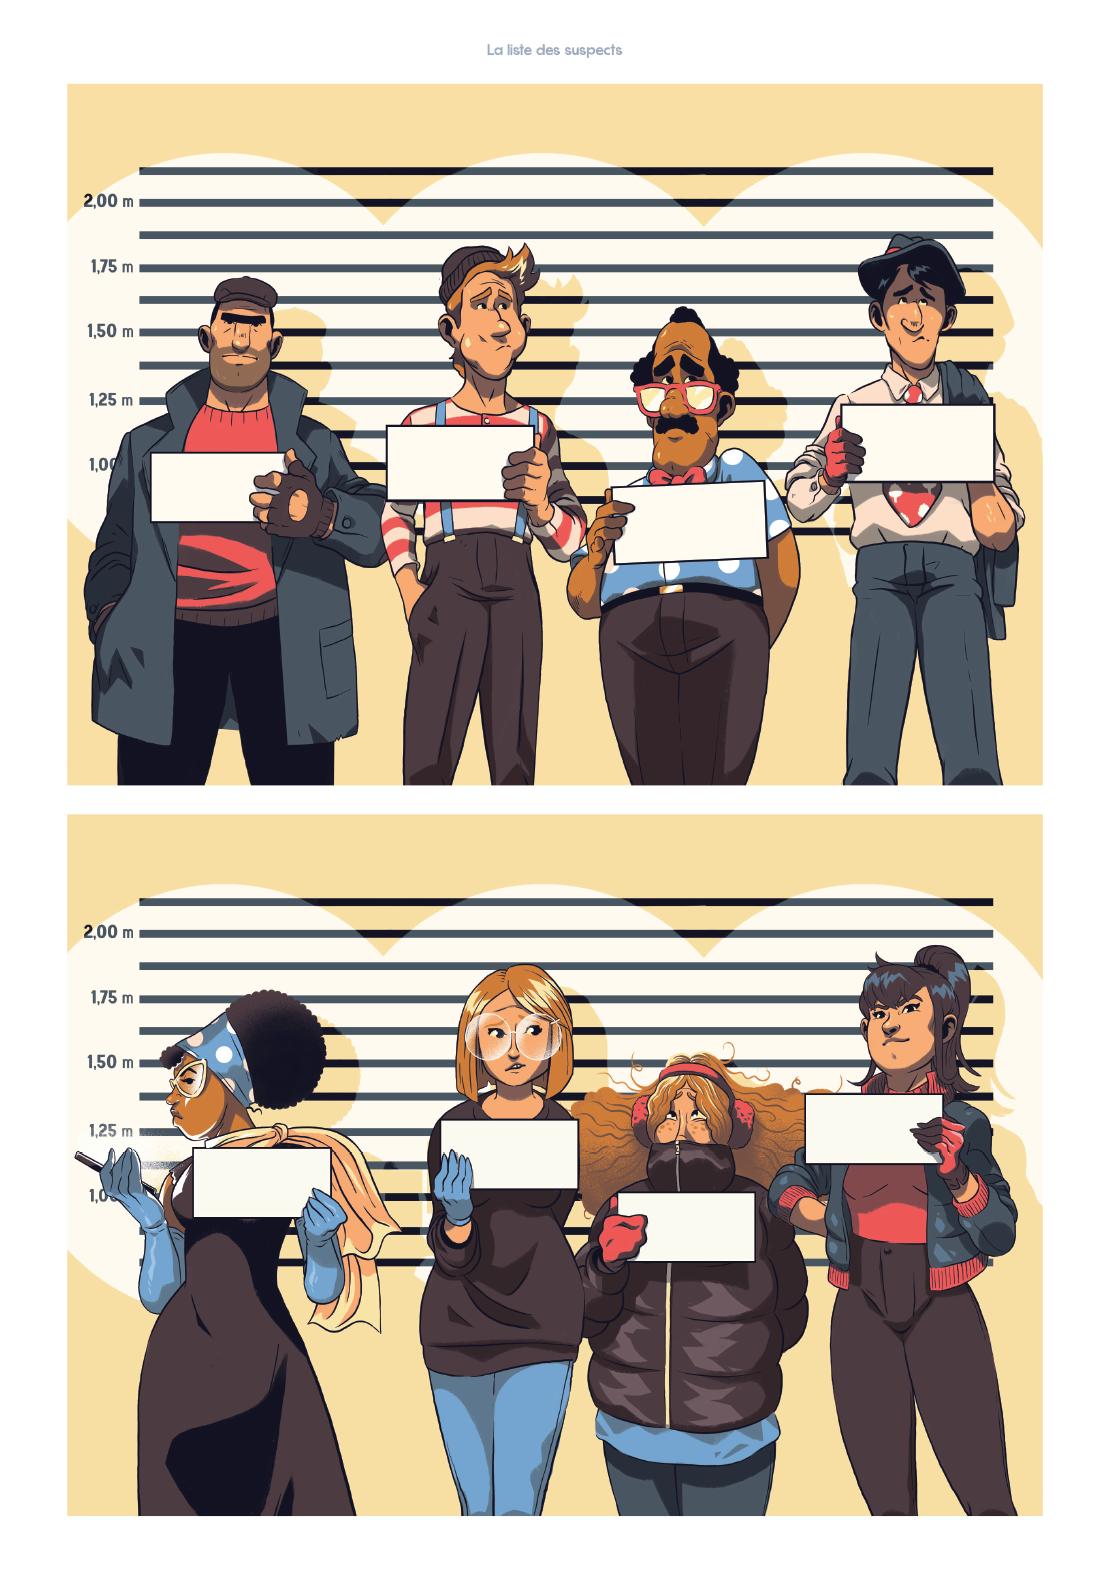 Illustration des suspects